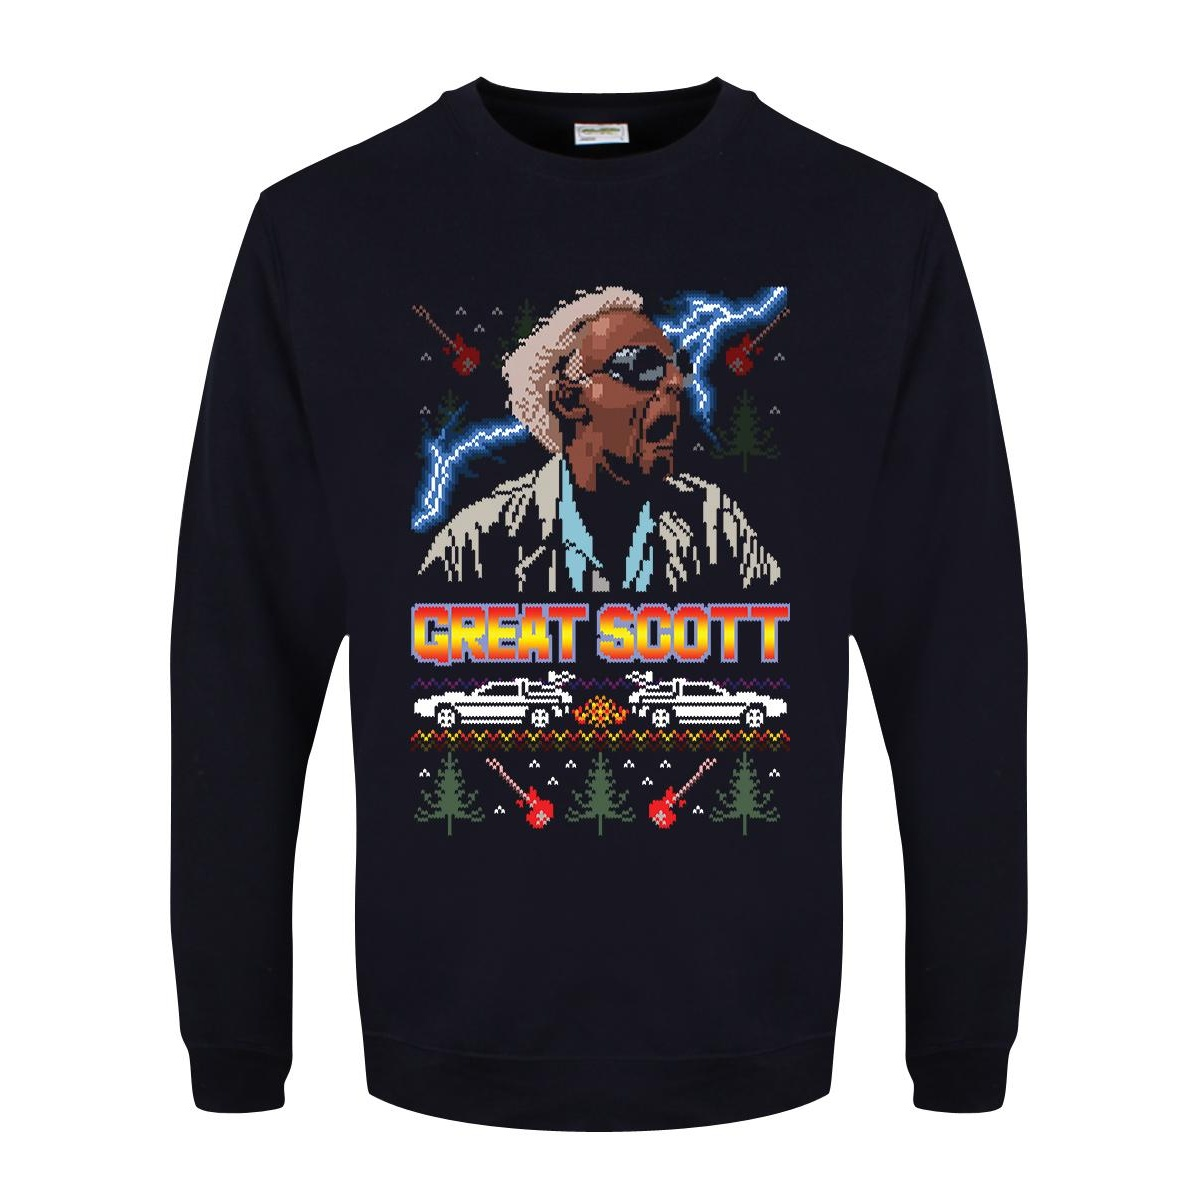 Grindstore Mens Great Scott Christmas Jumper (XL) (Navy Blue)